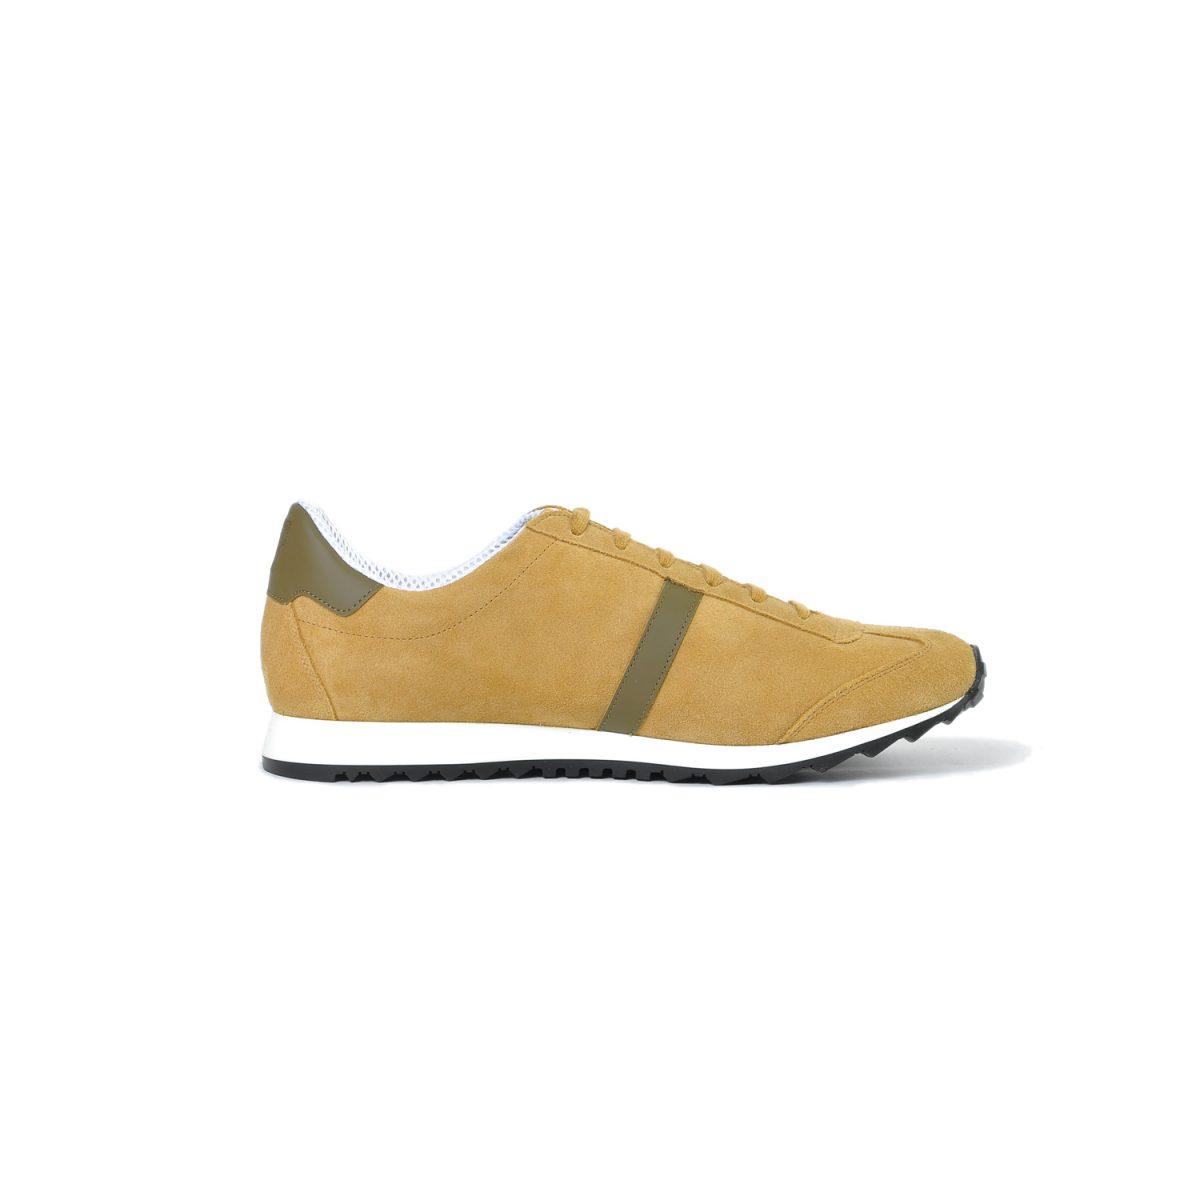 Tisza shoes - Martfű - Sand-khaki